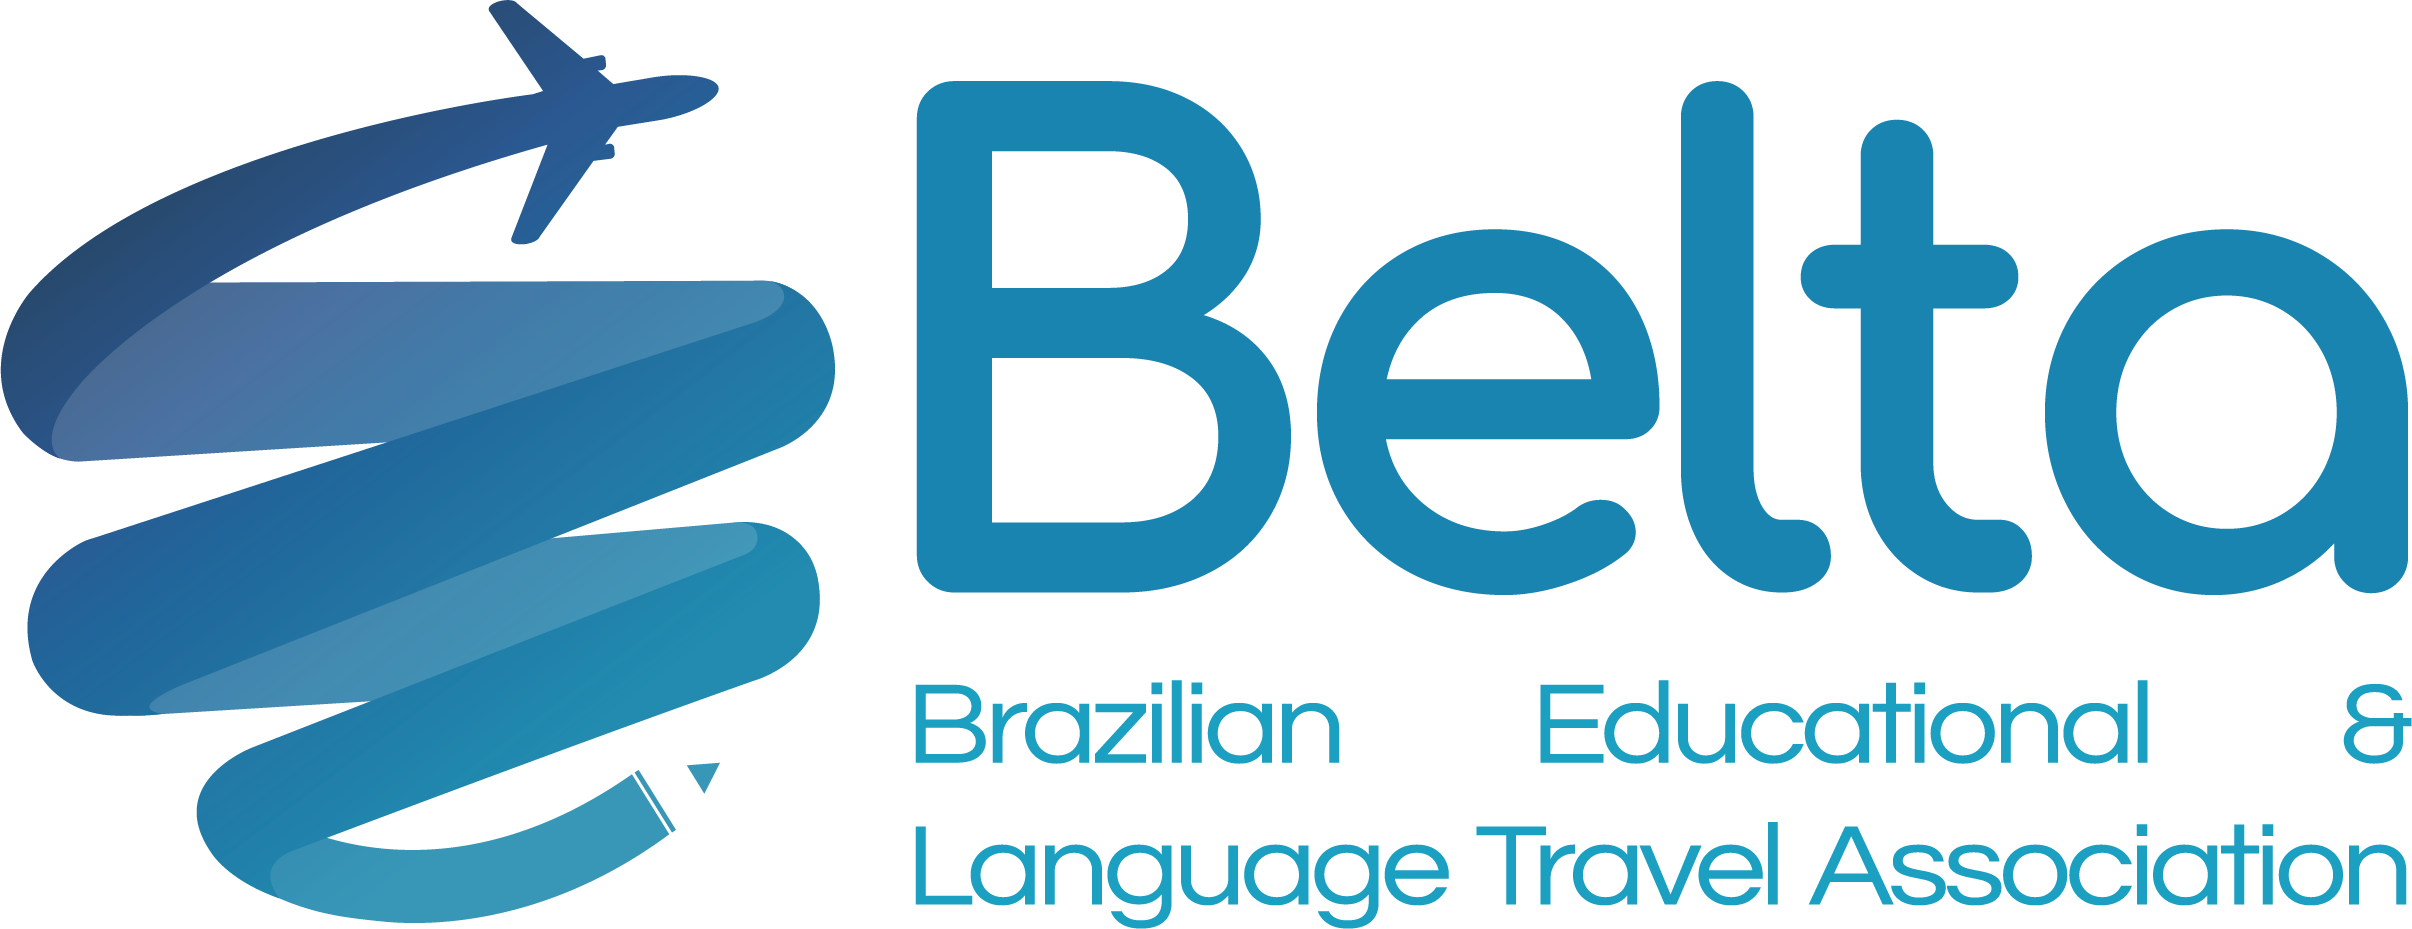 New brand and marketing plans for Brazilian association Belta